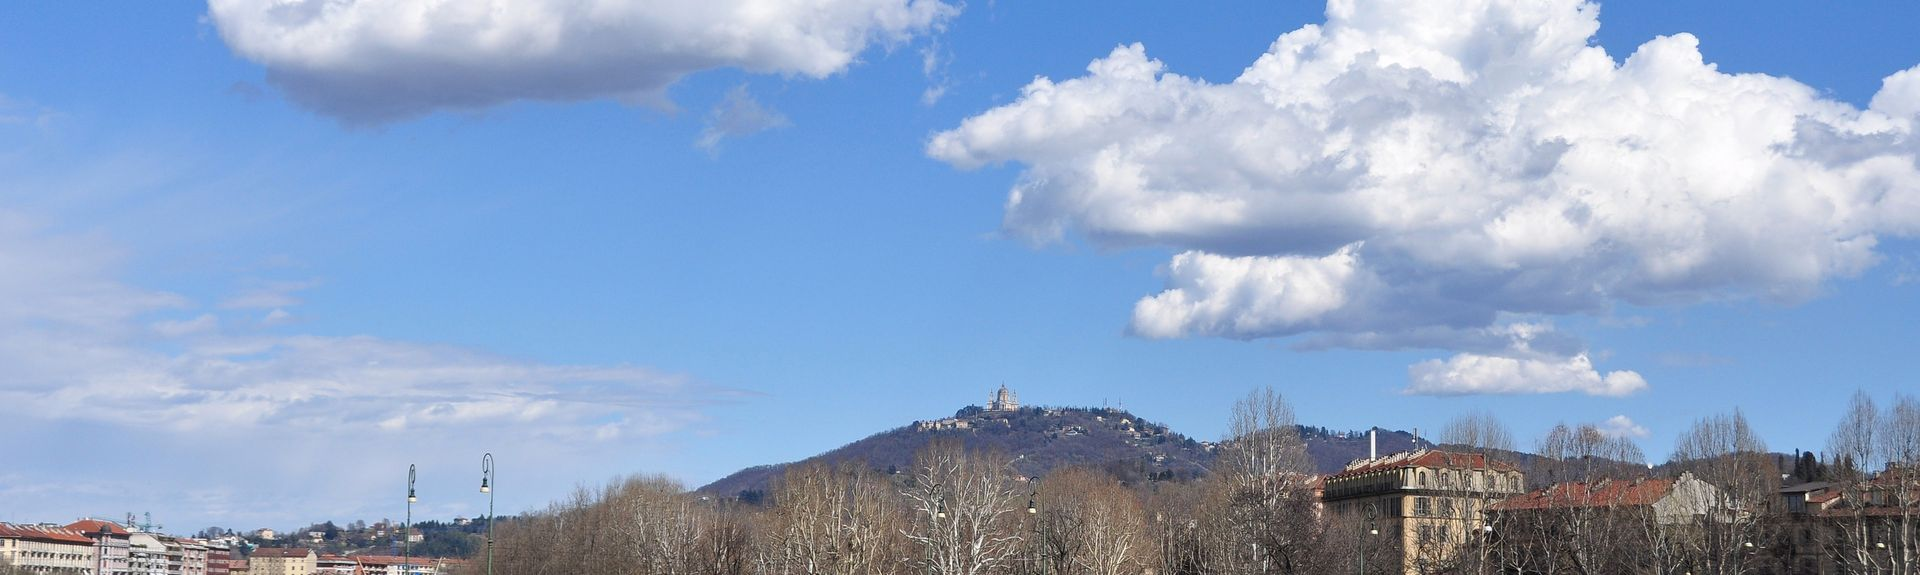 San Donato — Campidoglio, Turyn, Piemont, Włochy